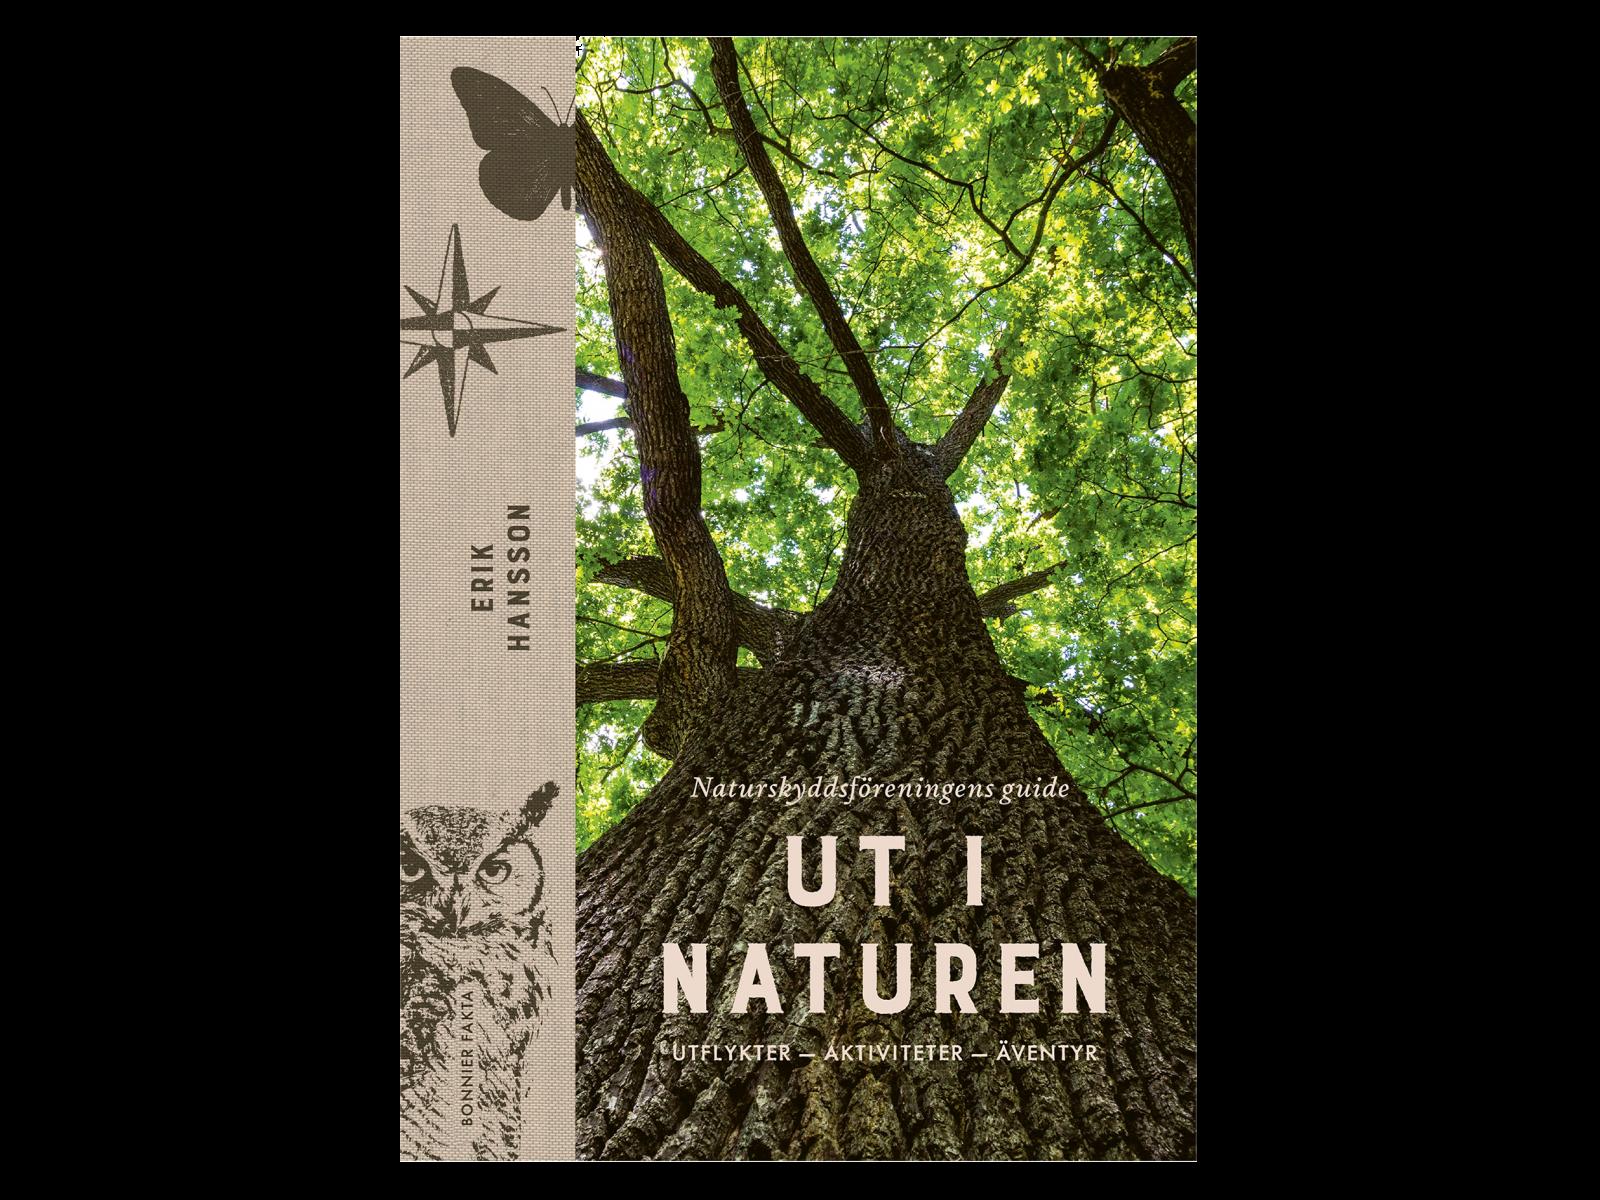 Bokomslag, e-bok, ut i naturen,